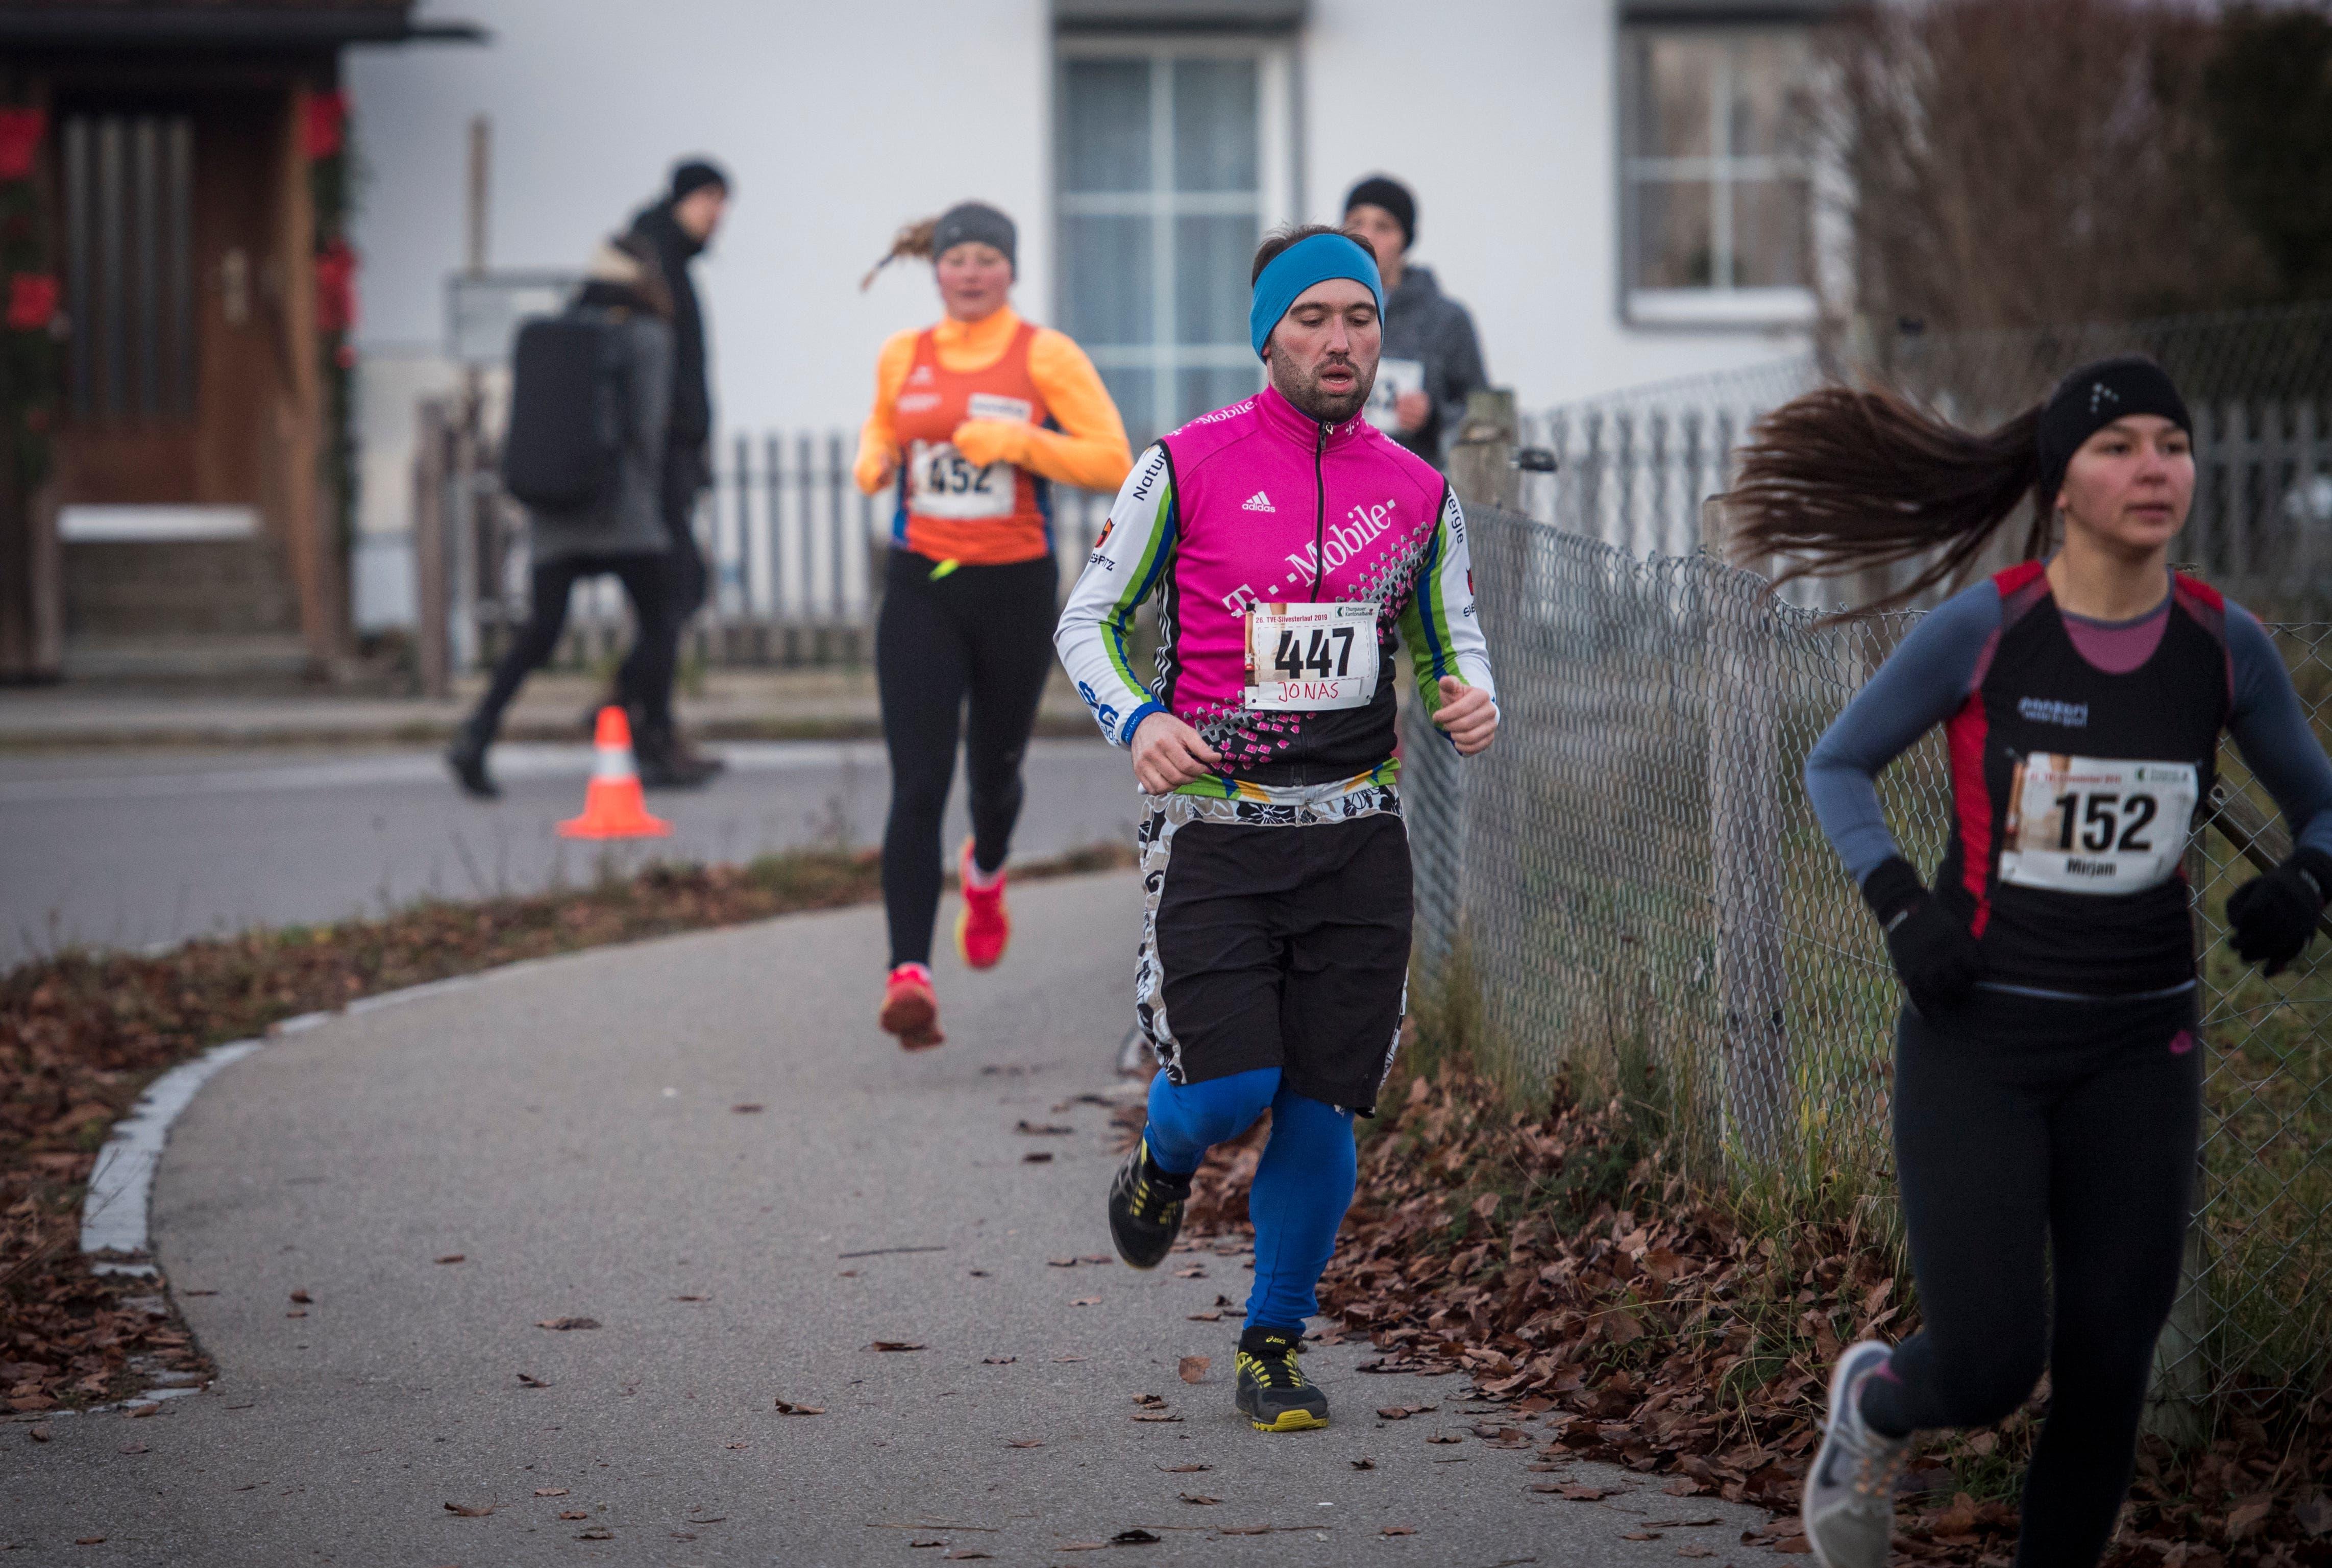 Eschlikon TG - Silvesterlauf 2019 in Eschlikon.